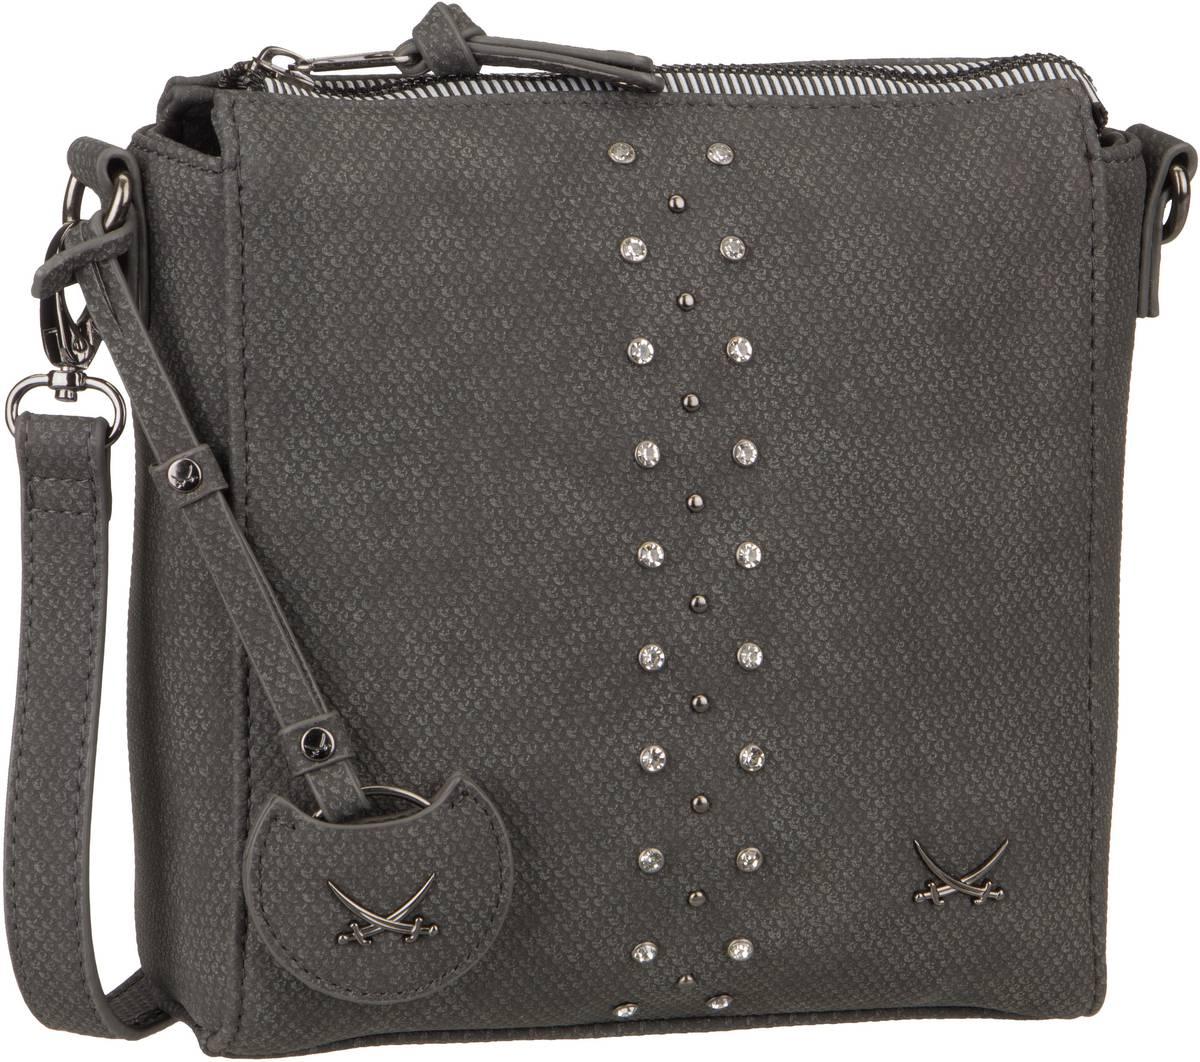 Umhängetasche Crossover Bag 1324 Anthracite